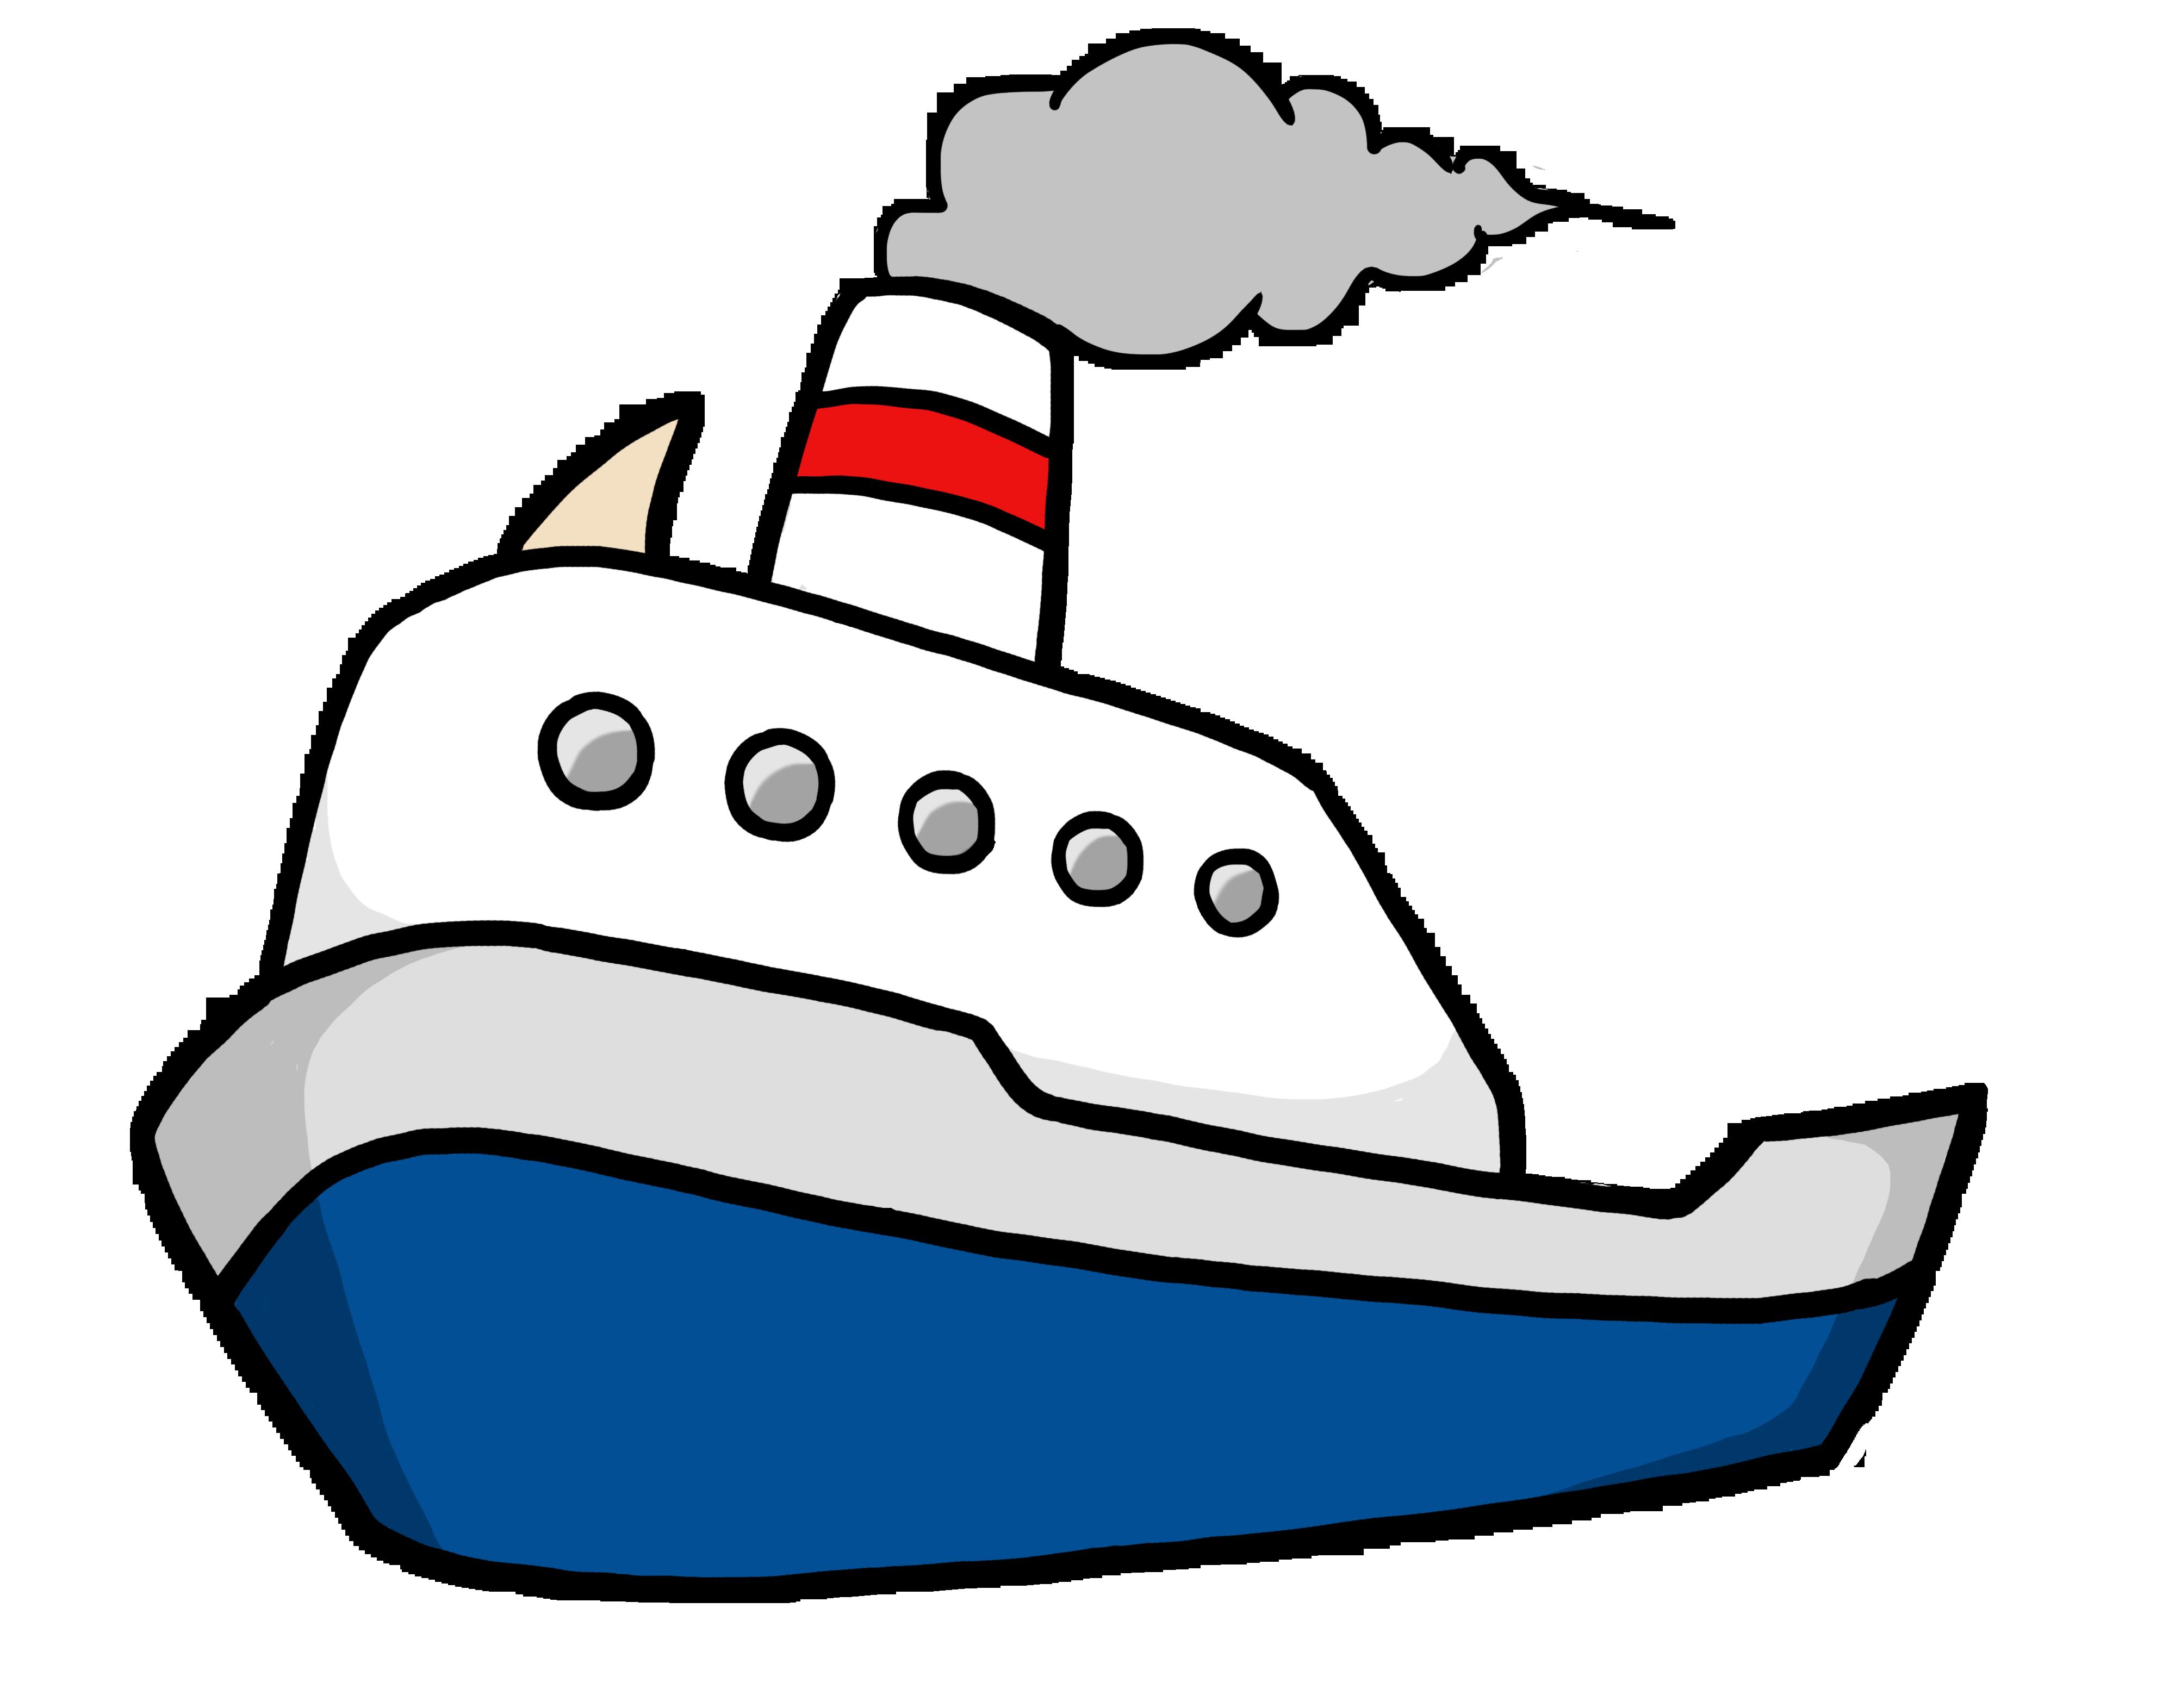 Row Boat Clipart Boat Clip Art